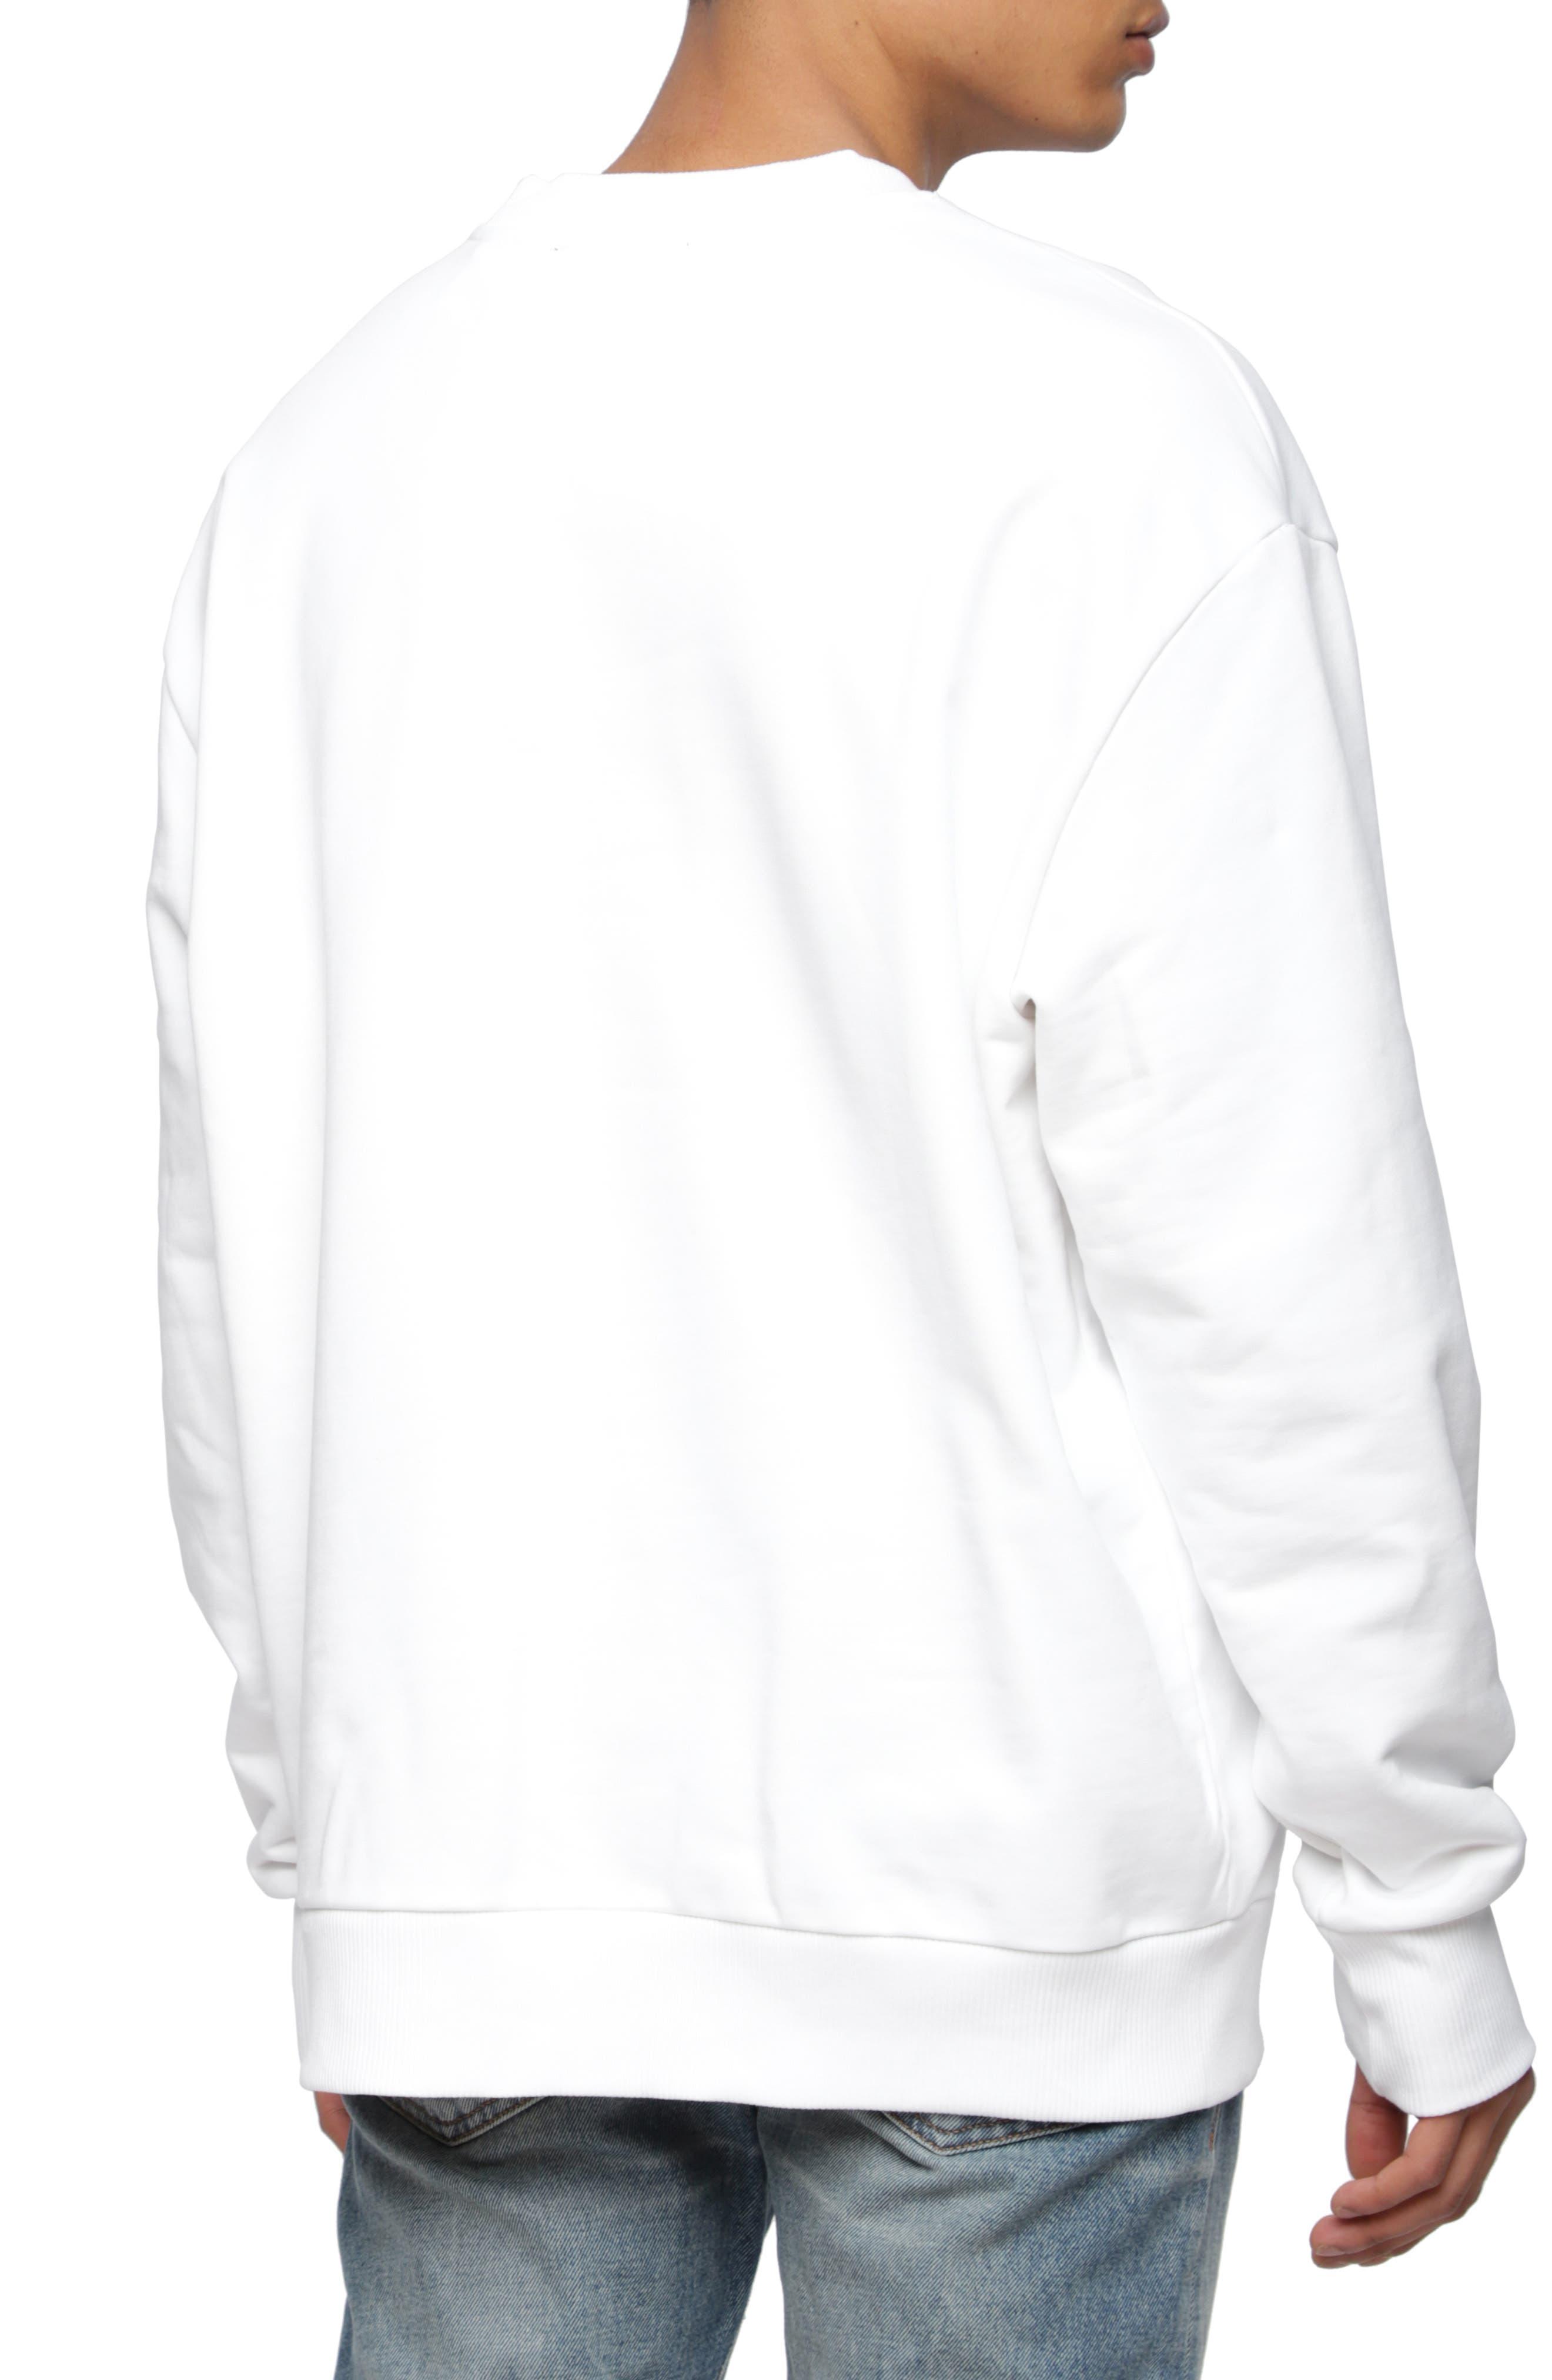 S-CREW-DIVISION Sweatshirt,                             Alternate thumbnail 2, color,                             WHITE